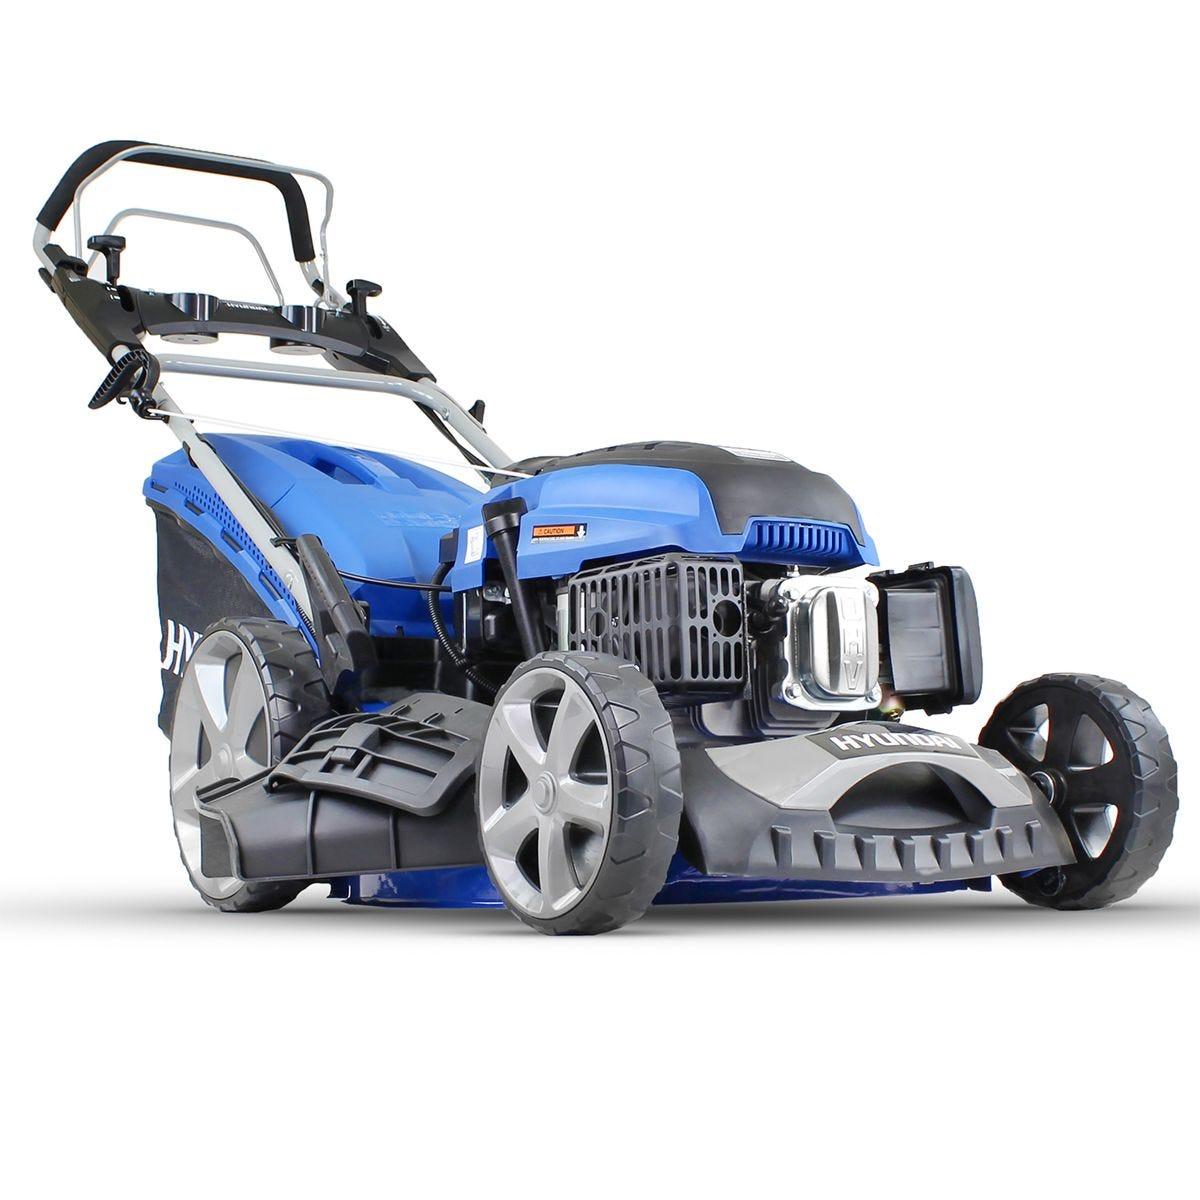 Hyundai HYM510SPE 173 cc Self Propelled Electric Push Button Start Petrol Lawnmower